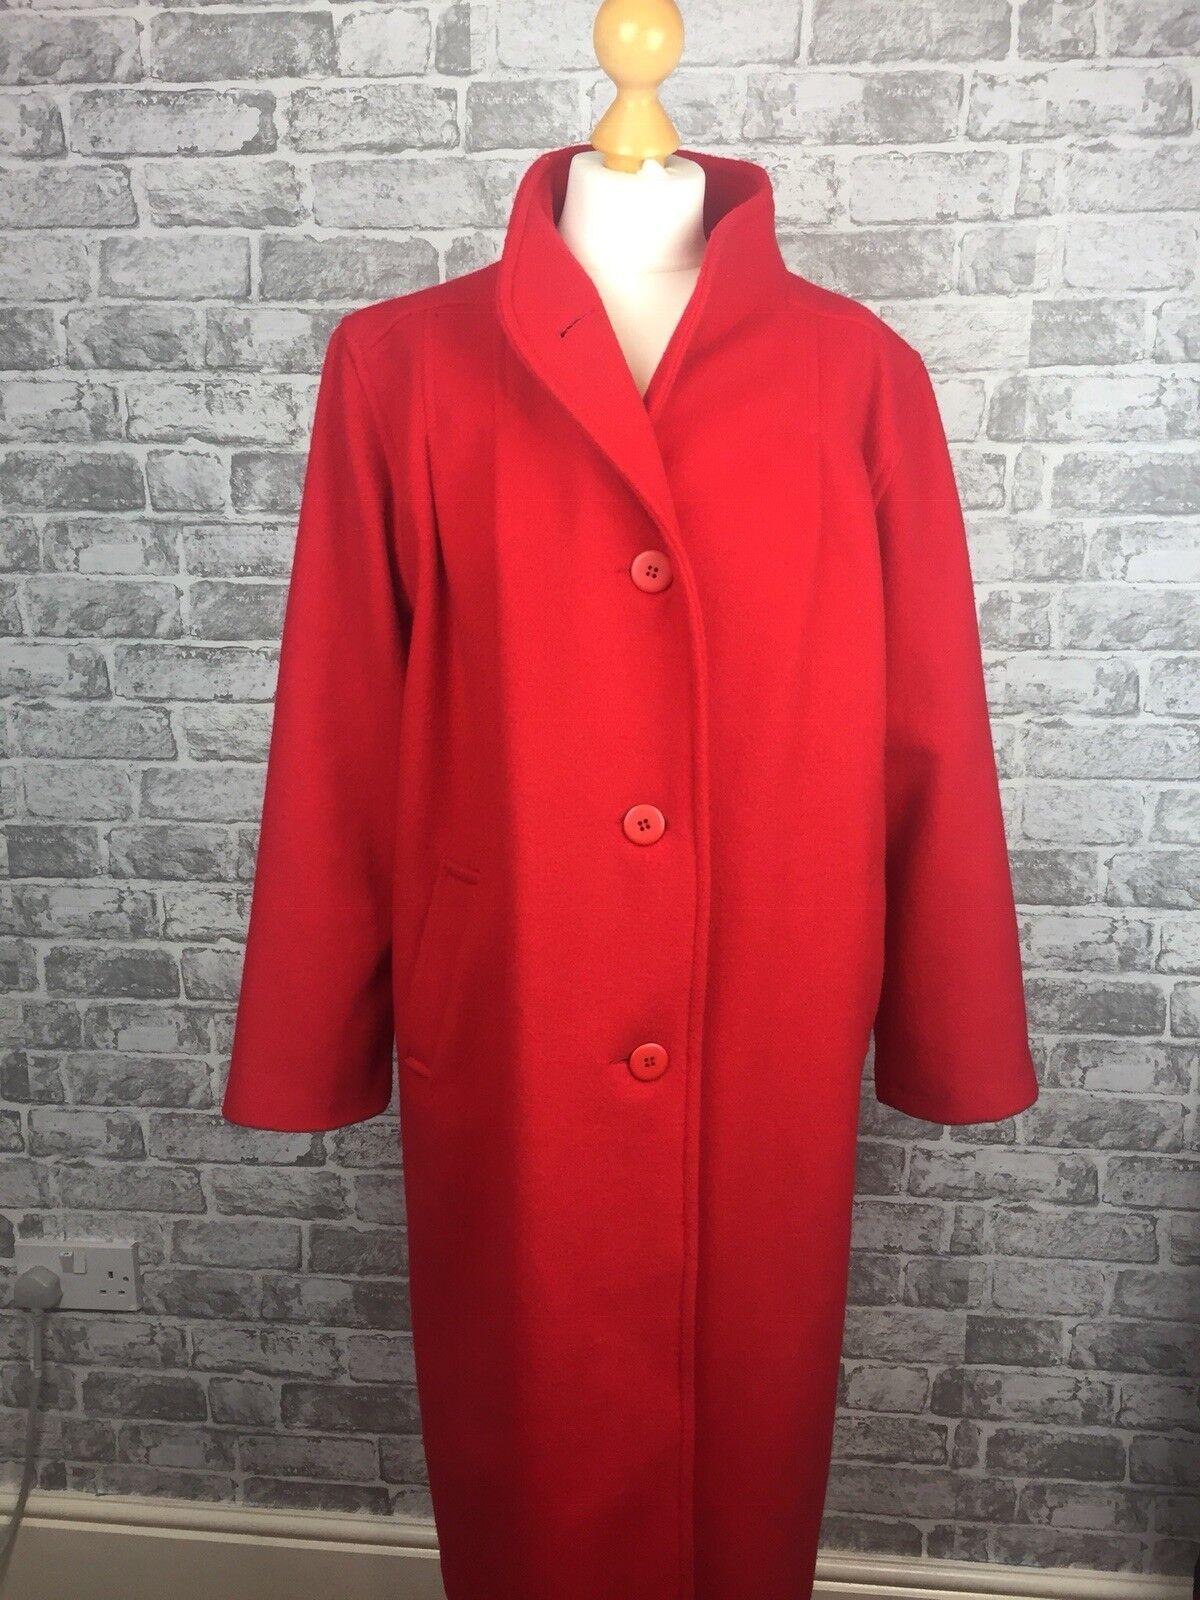 Debenhams rot 100% WOOL Long Coat Duster Winter Größe 14 Smart Career